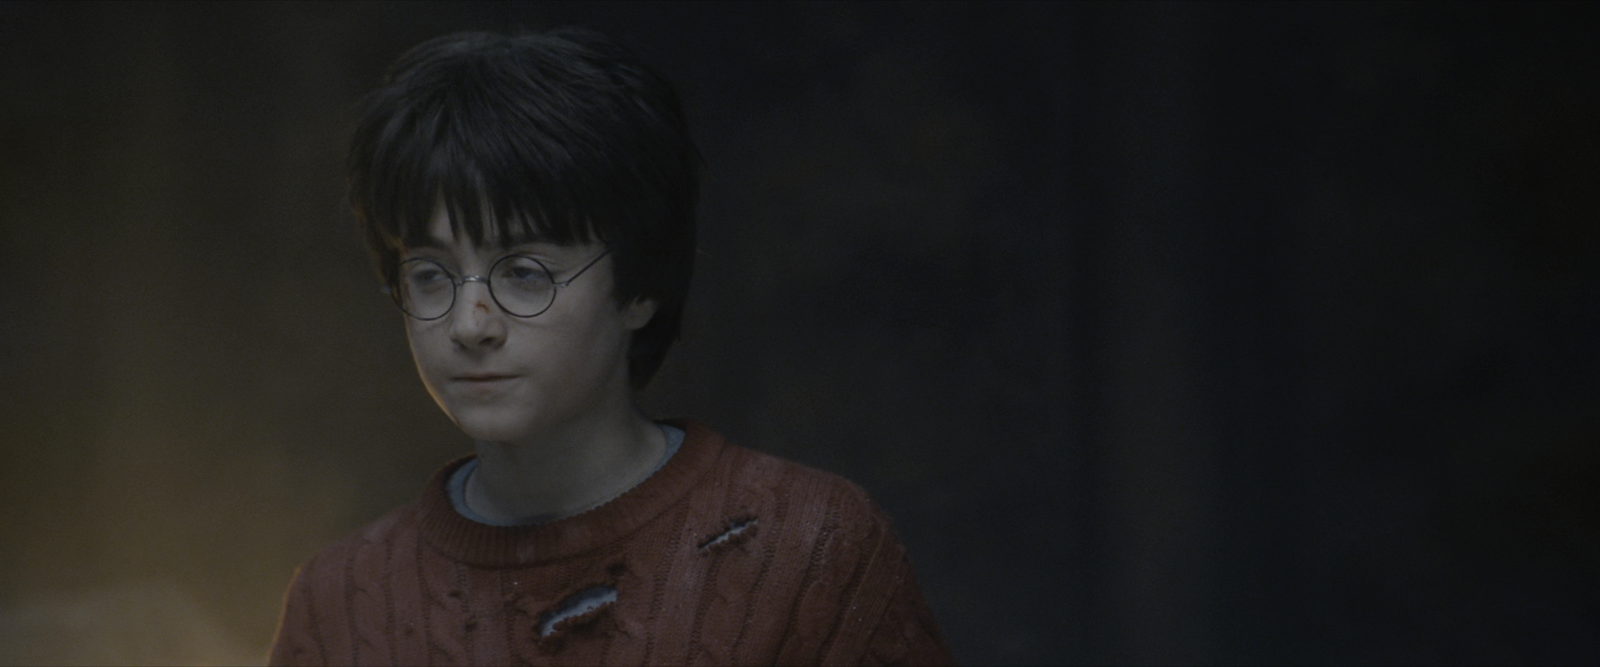 Harry Potter y la Piedra Filosofal (2001) 4K UHD [HDR] Latino - Castellano - Ingles captura 4